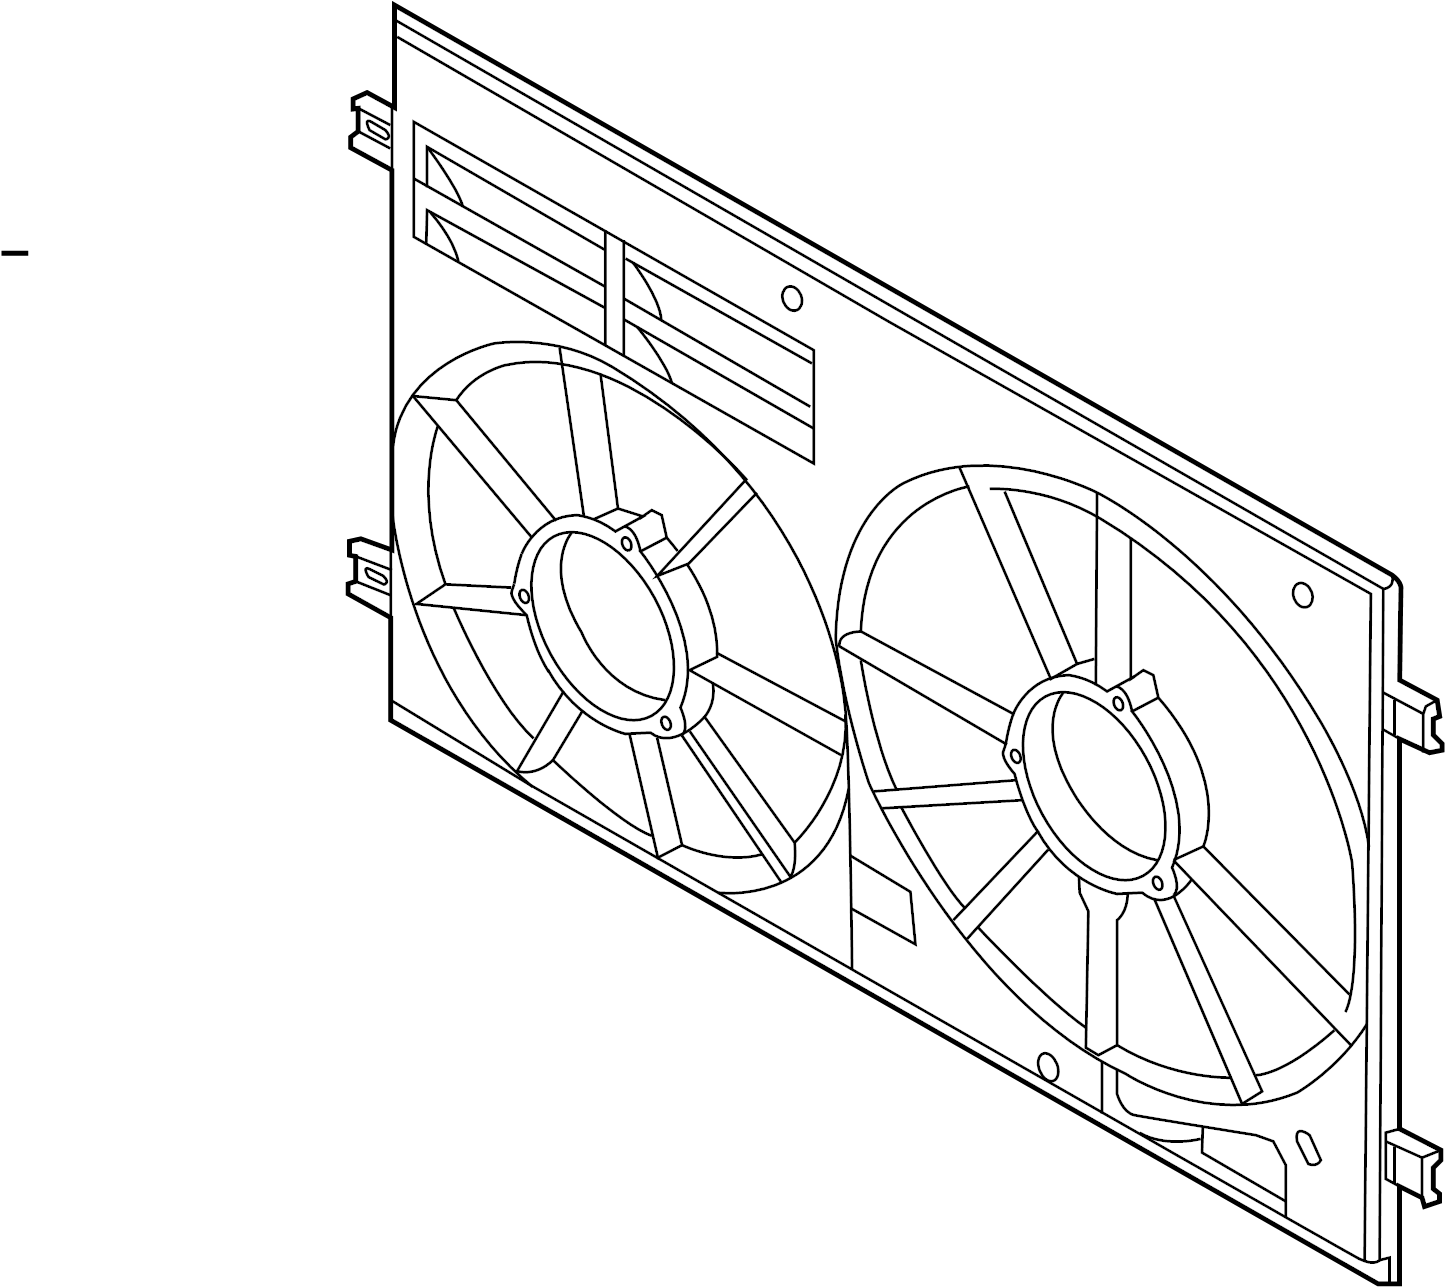 Volkswagen Golf R Shroud Fan Cowl Engine Cooling Front Duct Audi Volkswagen